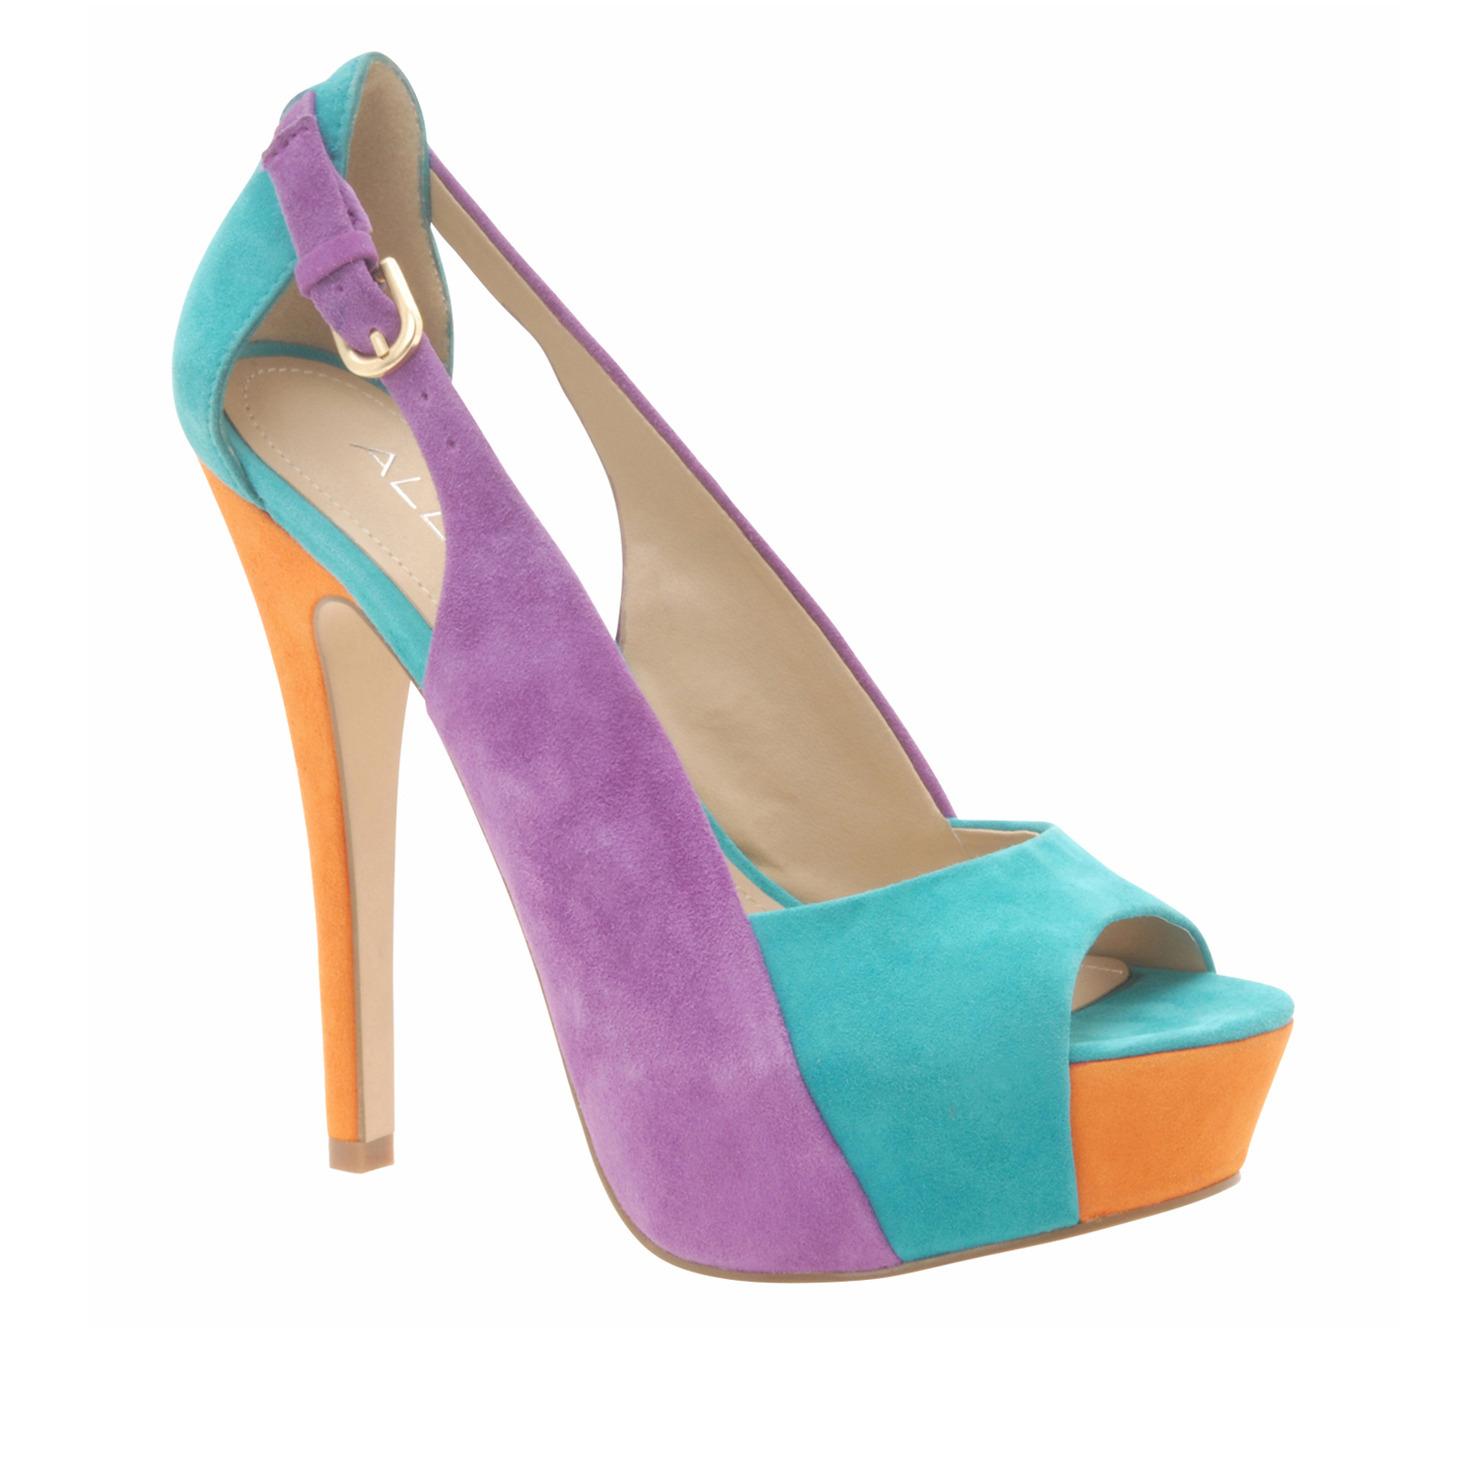 womens high heel shoes fashion multi colored stylish heels